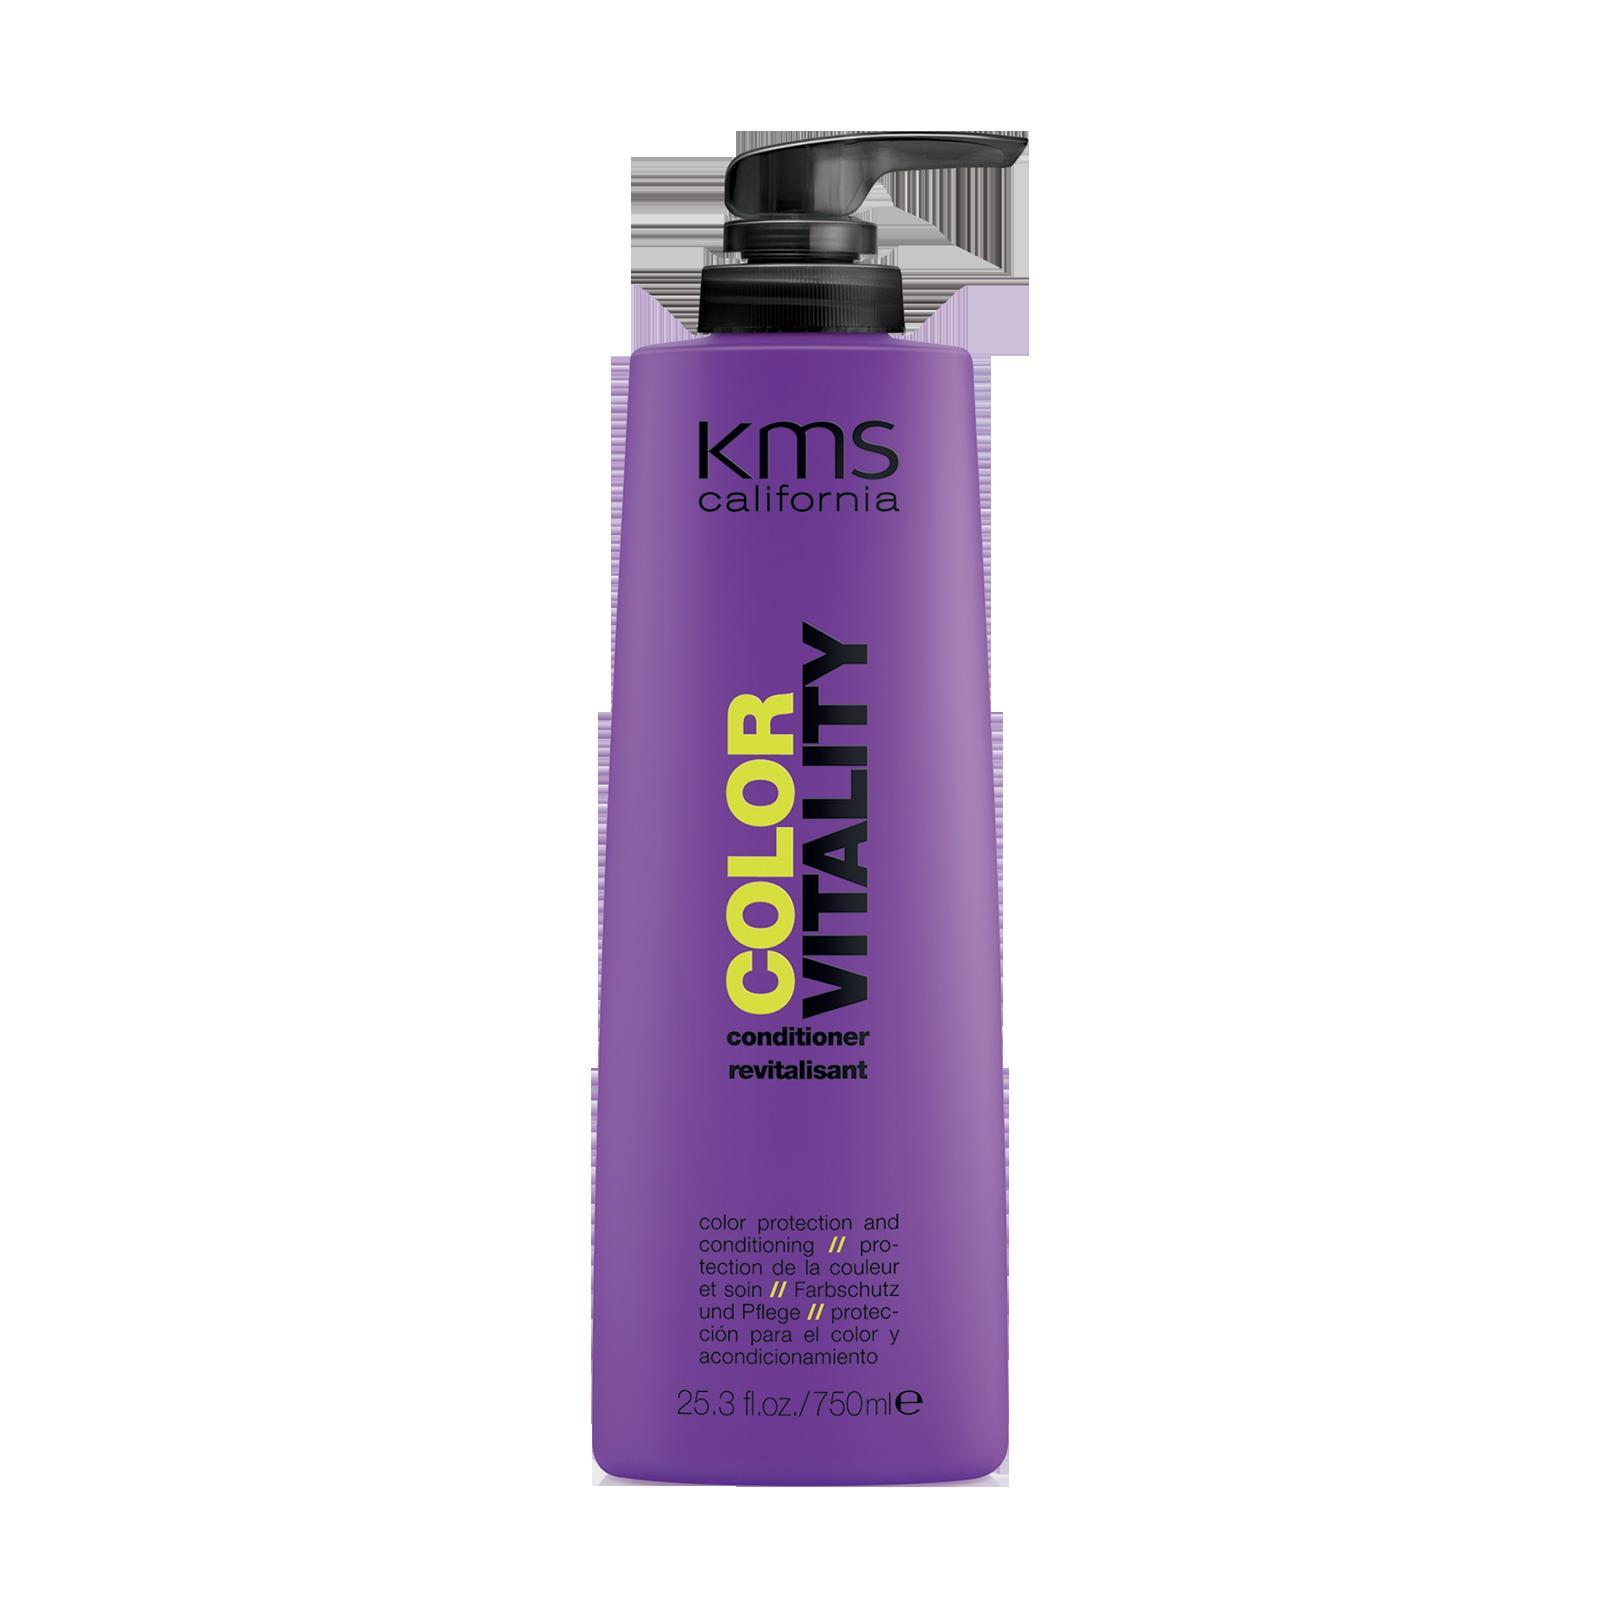 Dandruff Shampoo For Colored Hair Elvive Clay Shampoo Anti Dandruff